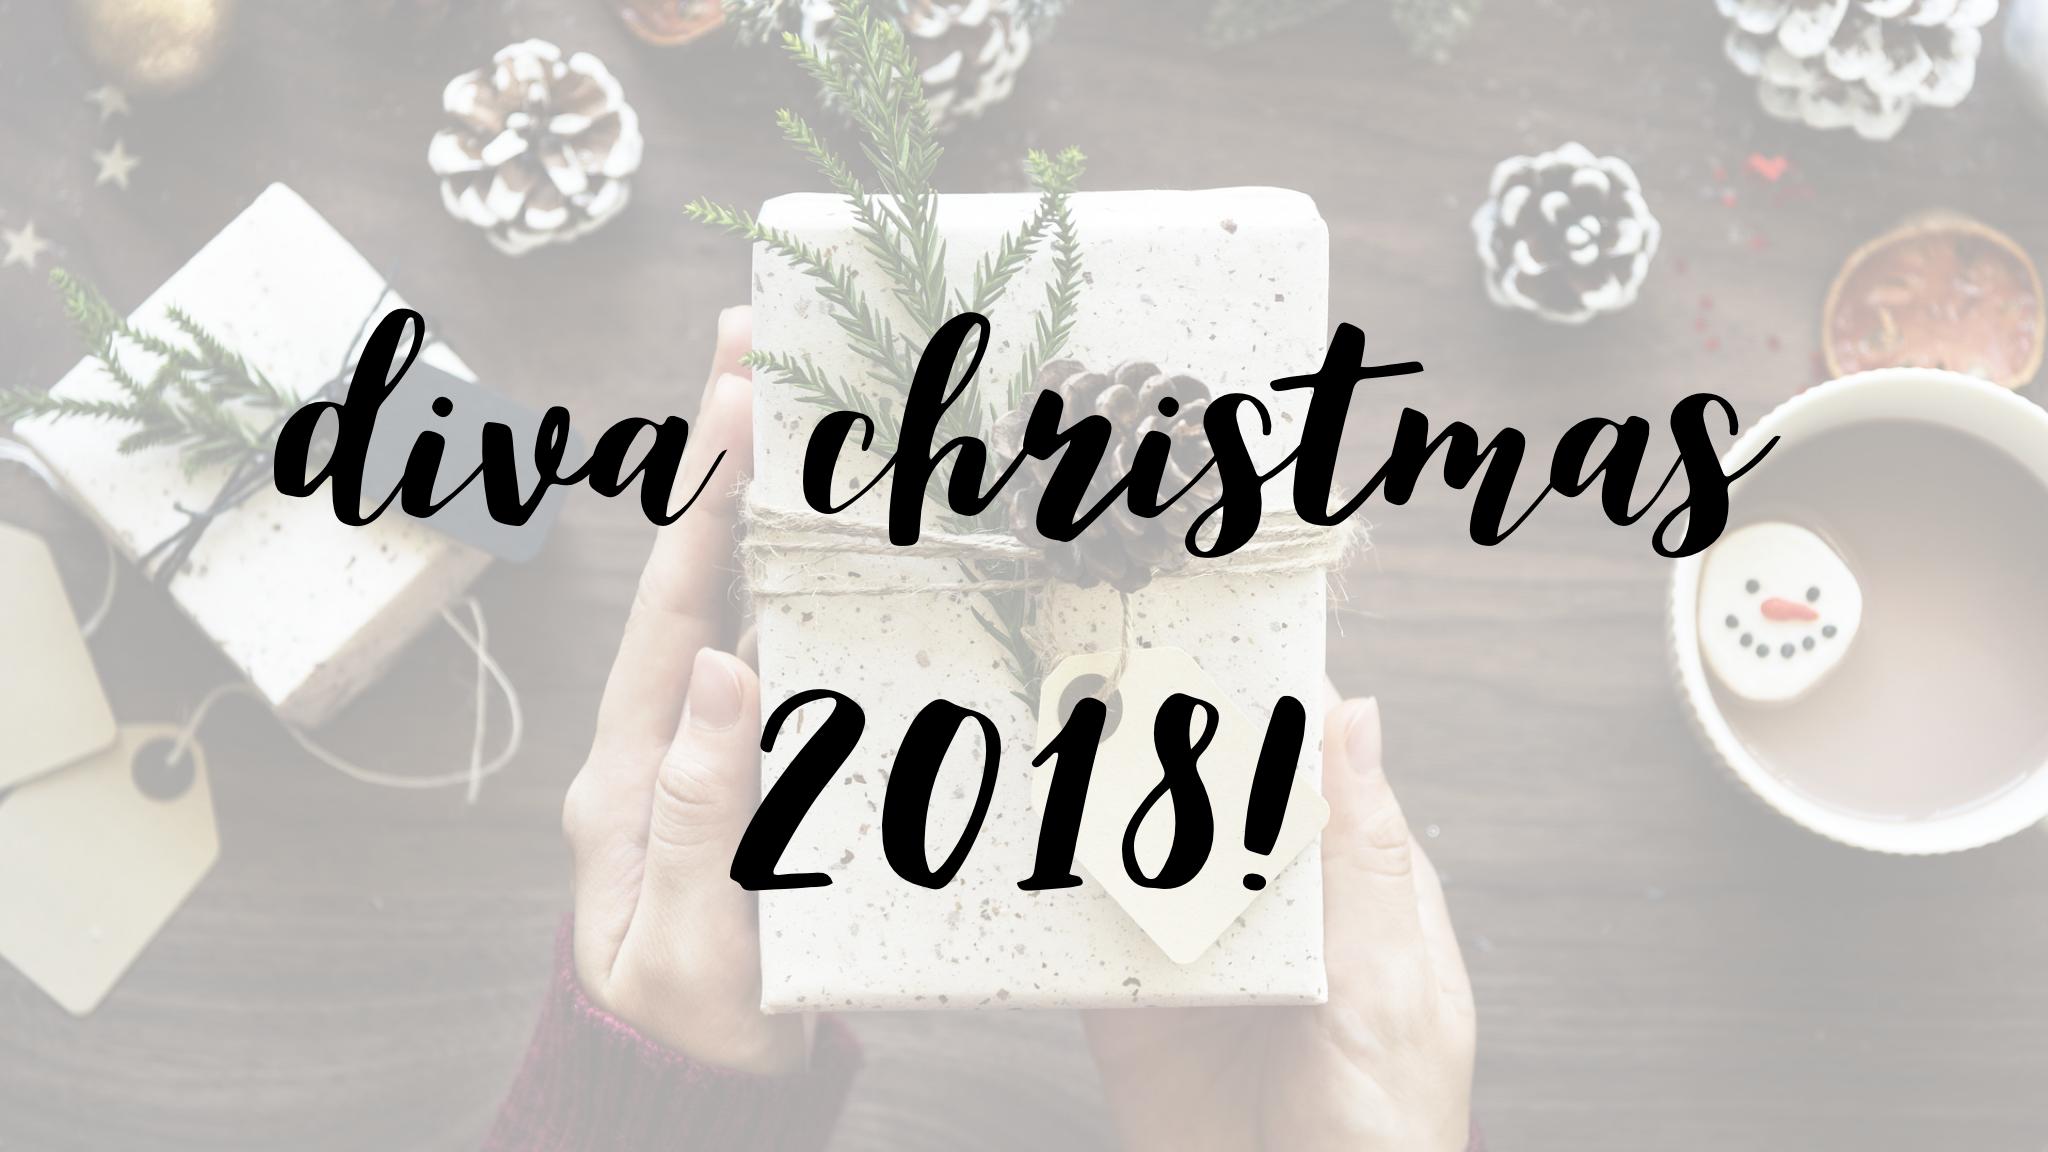 Diva Christmas 2018!